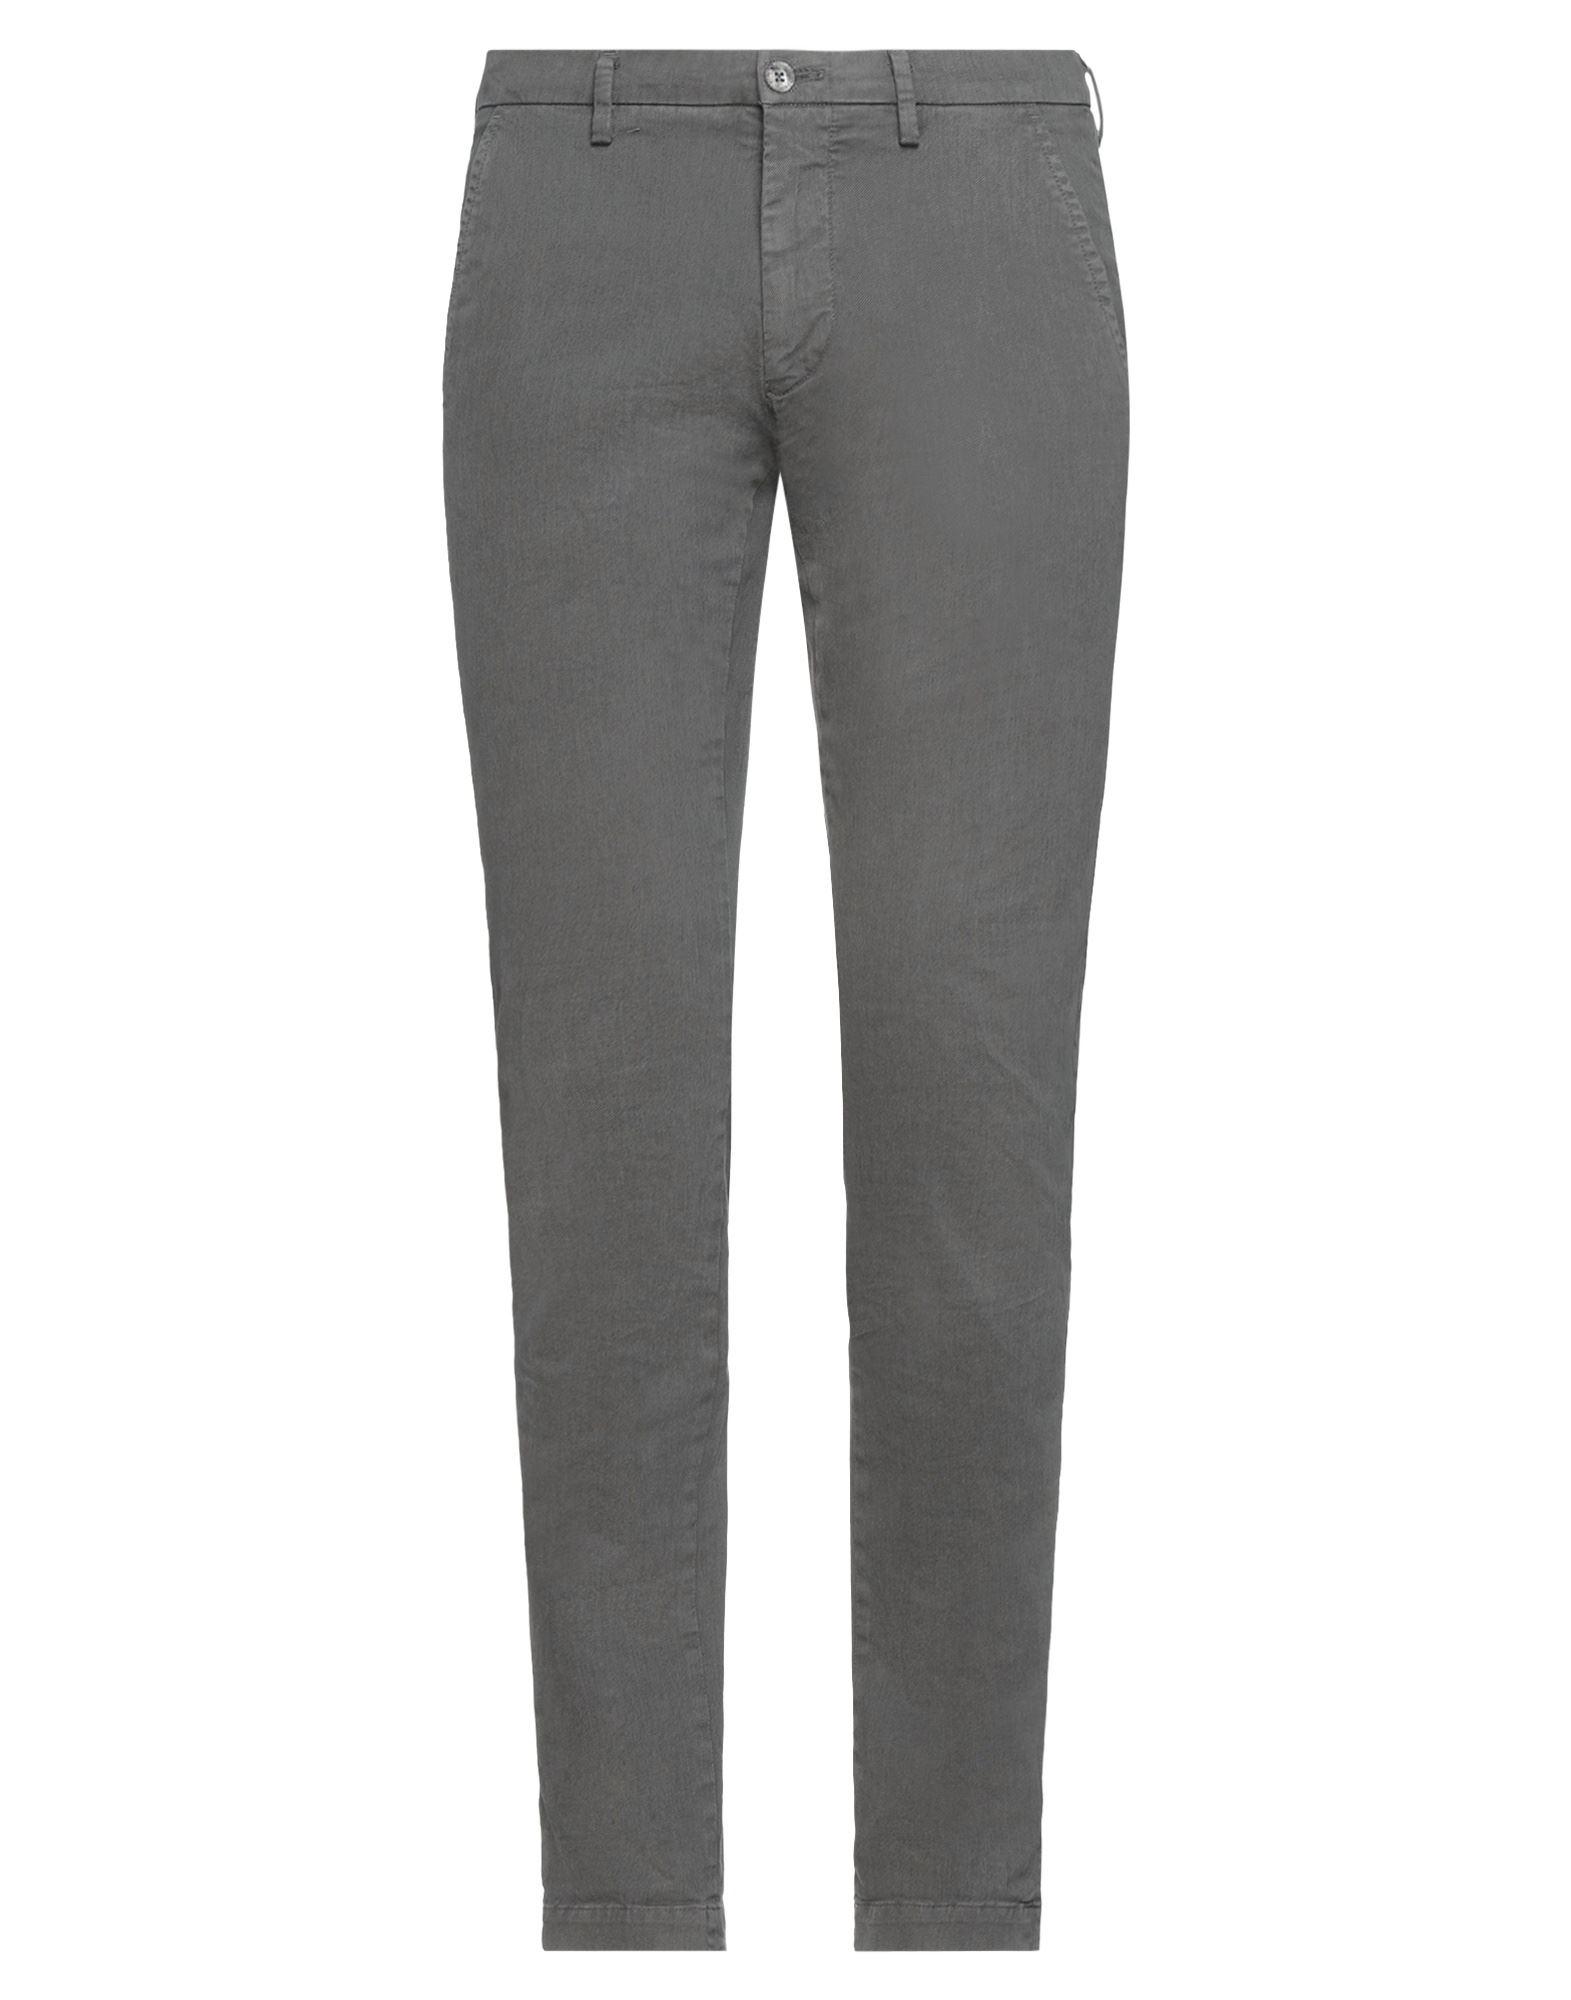 Mason's Casual Pants In Gray